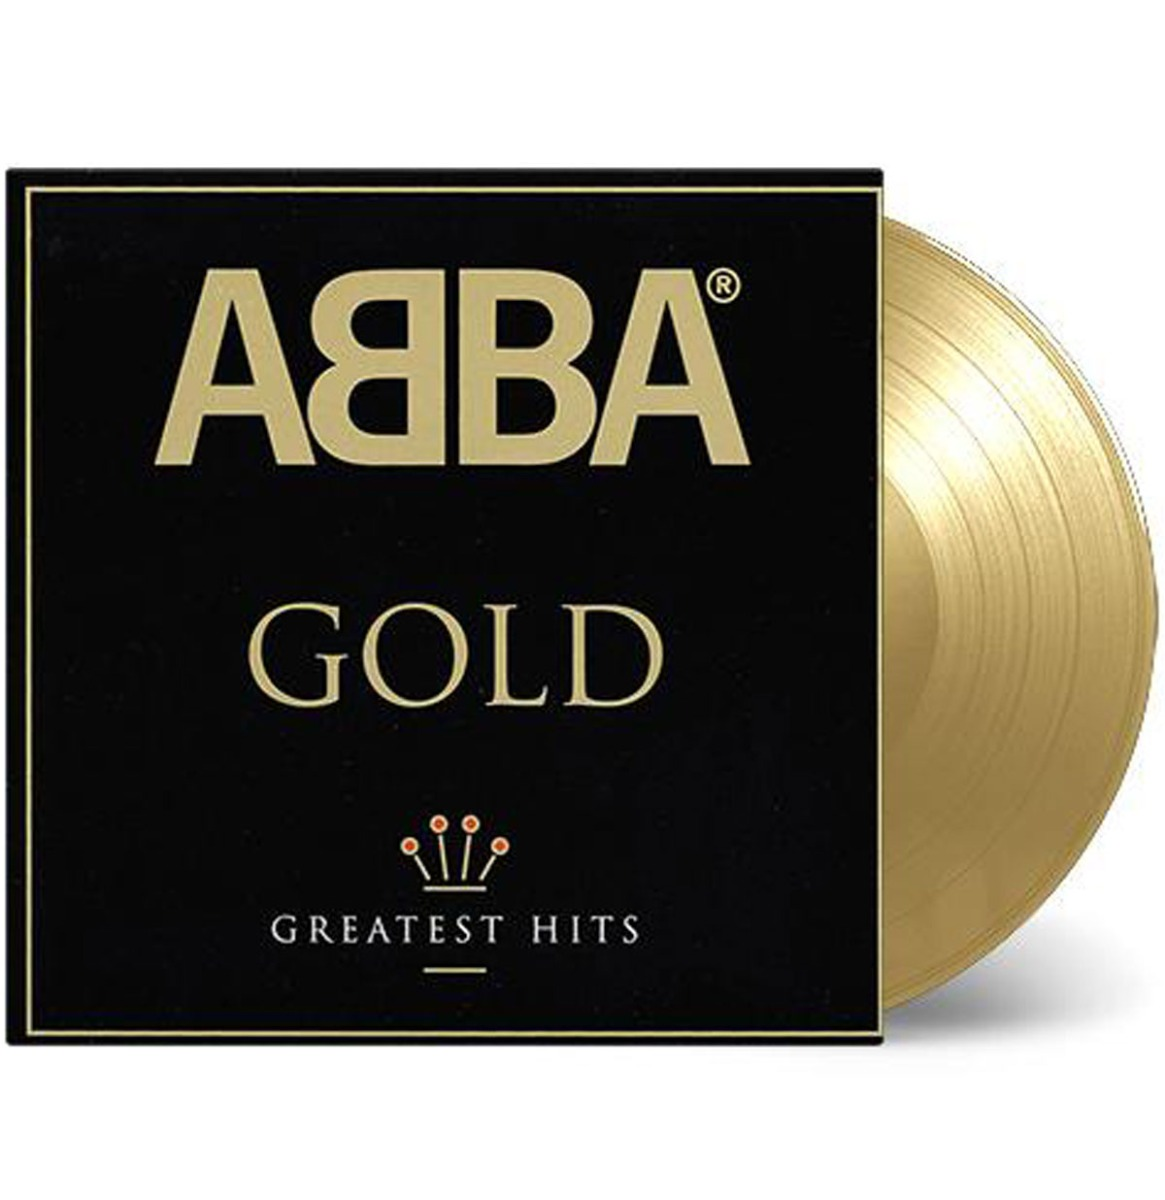 ABBA - Gold Greatest Hits Gelimiteerd Goud Vinyl 2LP